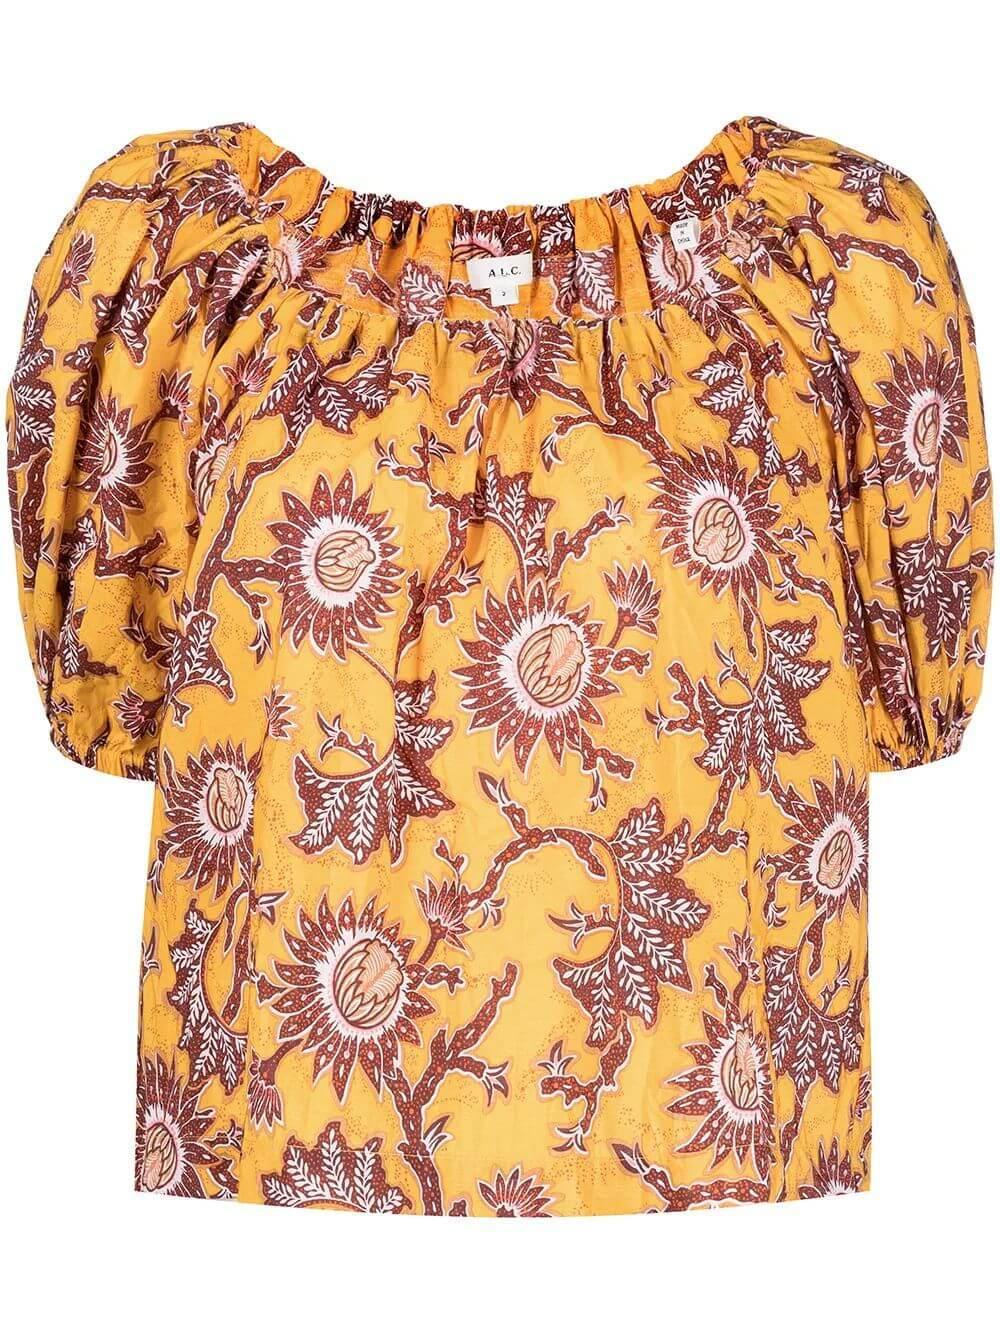 Mara Printed Puff Sleeve Top Item # 5TOPS01049